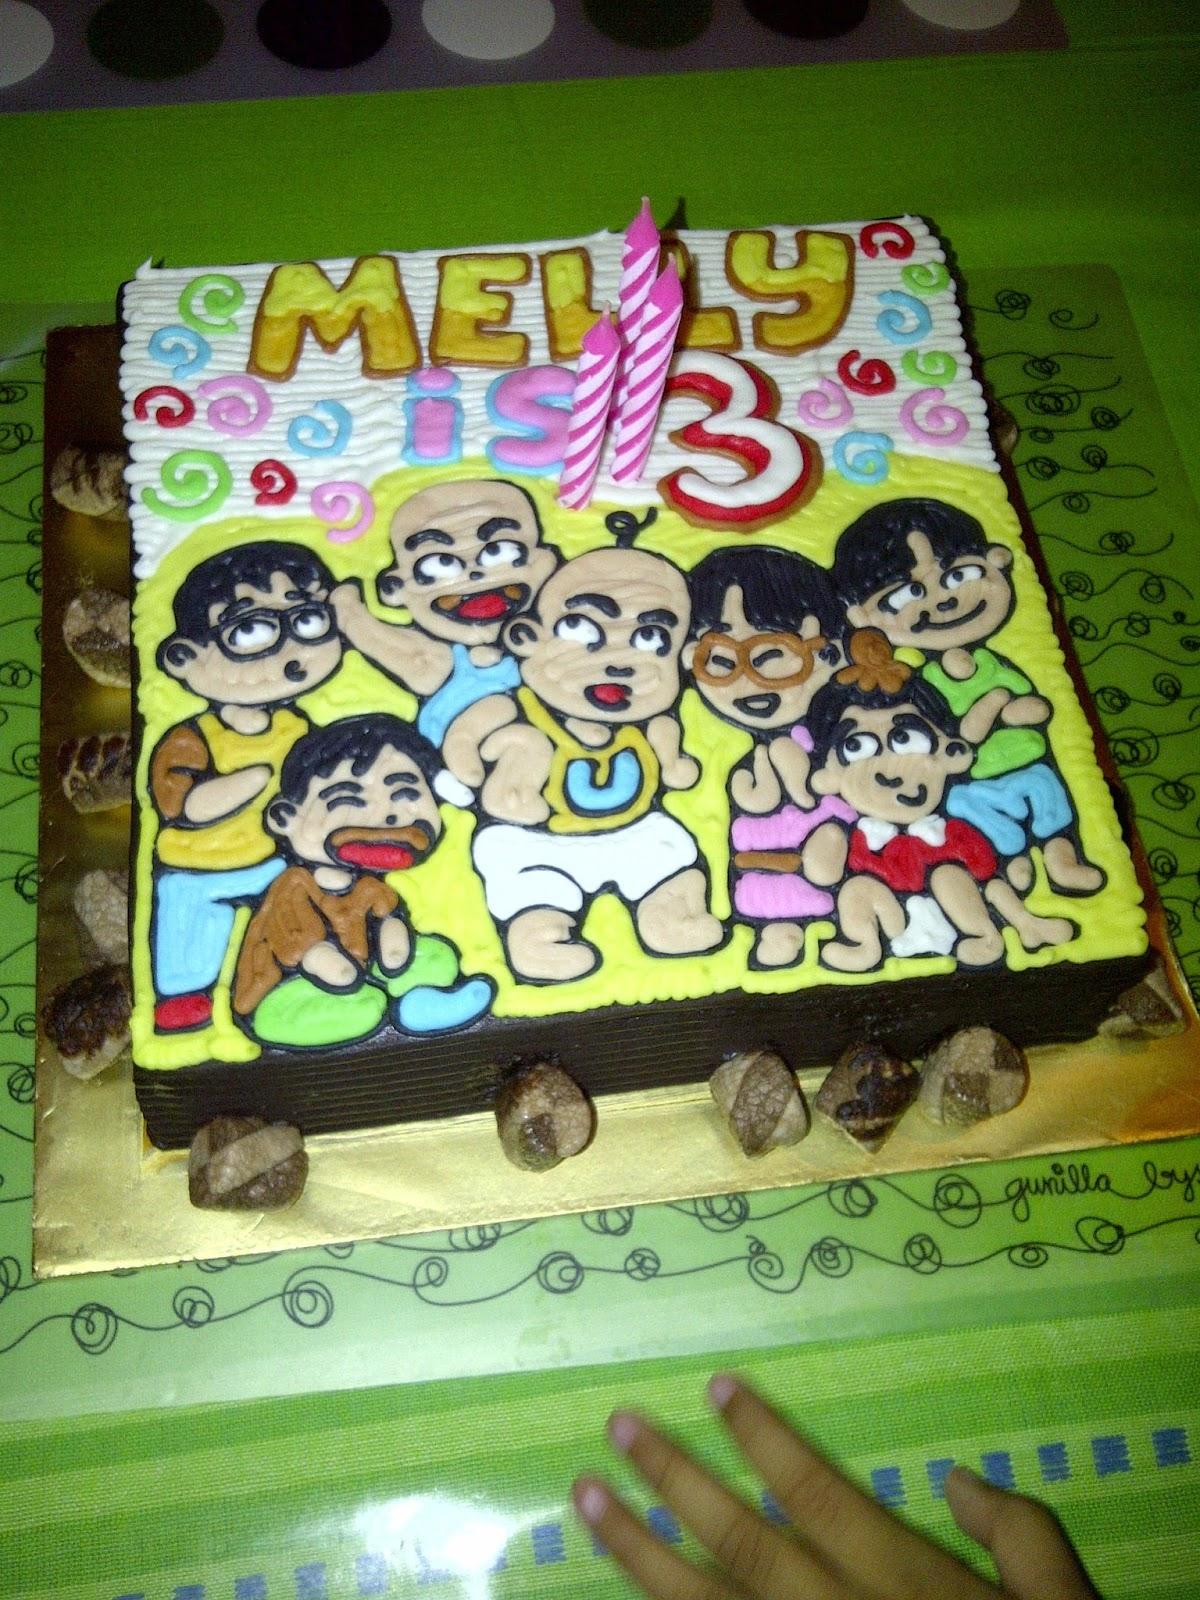 Melindas Life Journey Birthday Cake